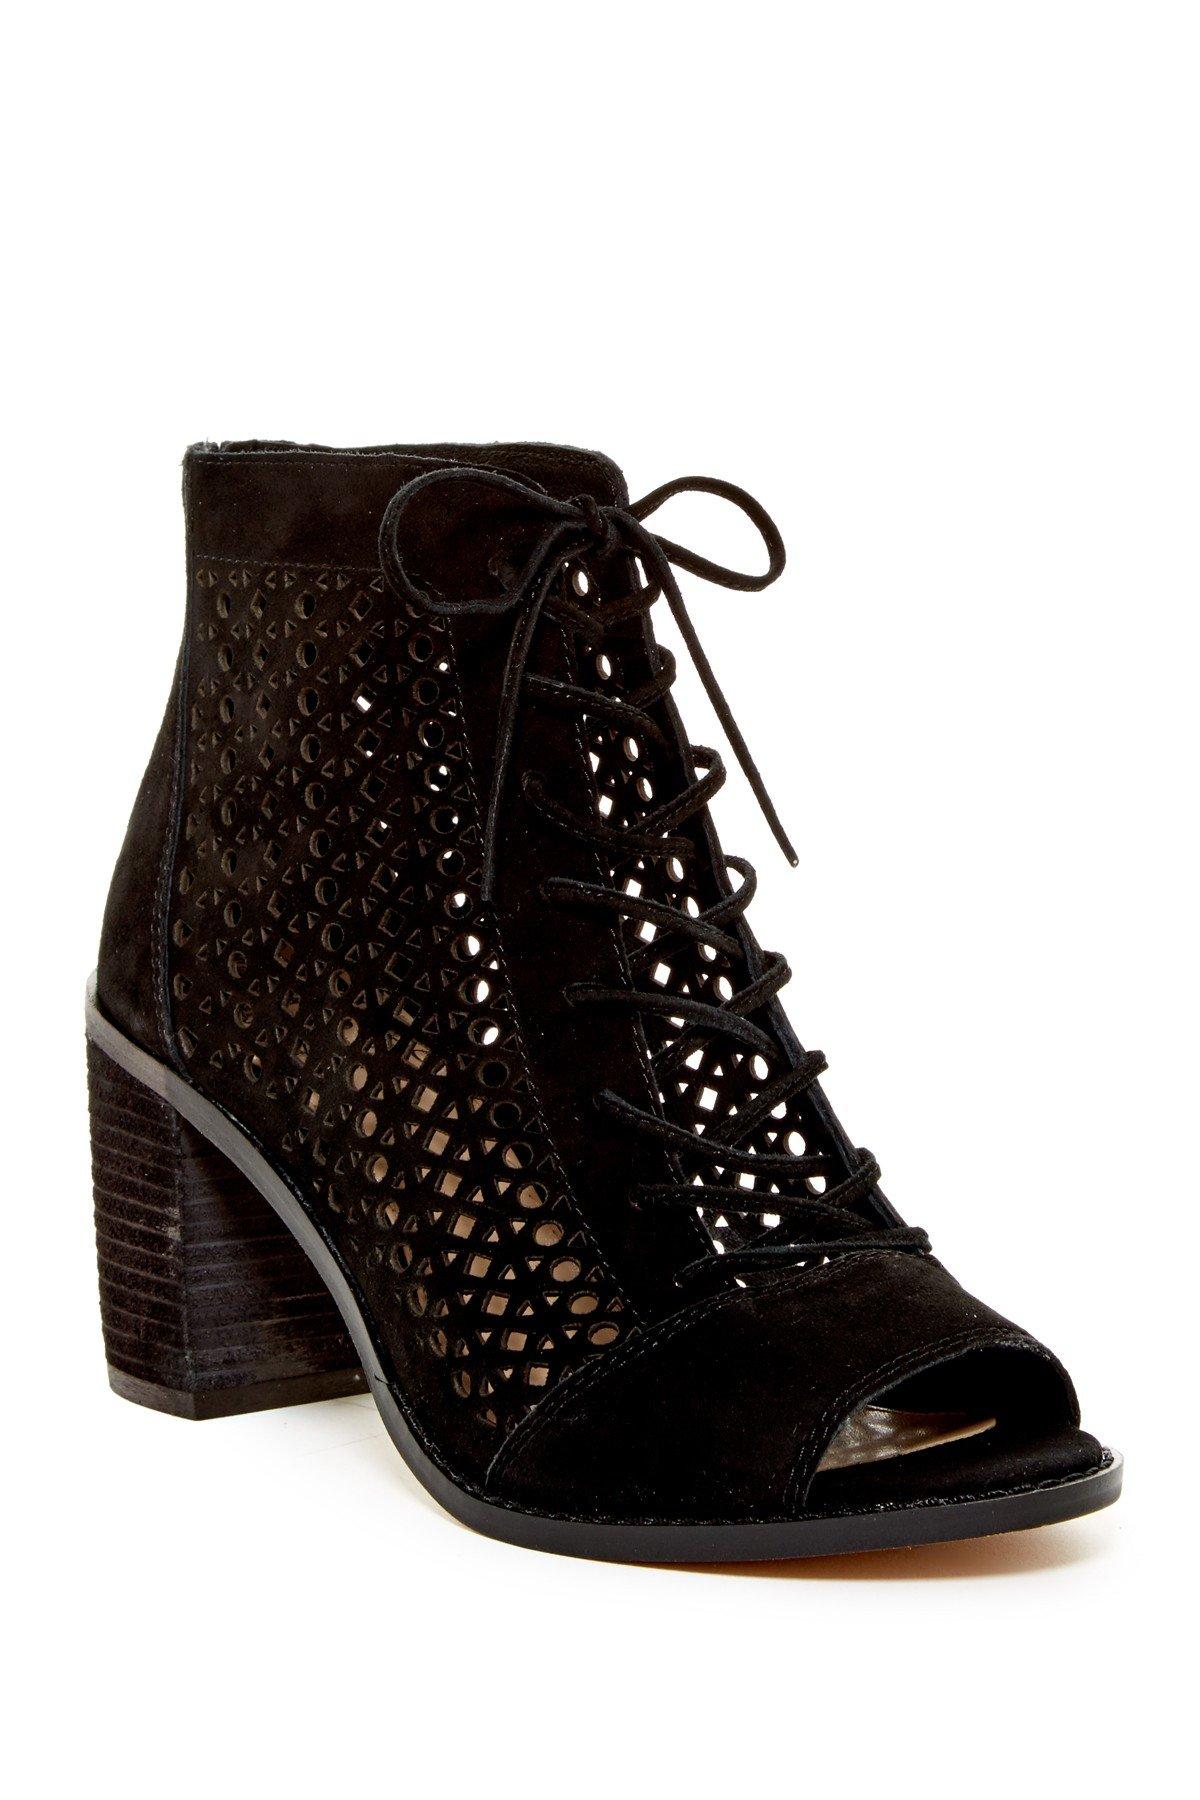 Vince Camuto Women's Trevan Ankle Bootie, Black, 9.5 M US